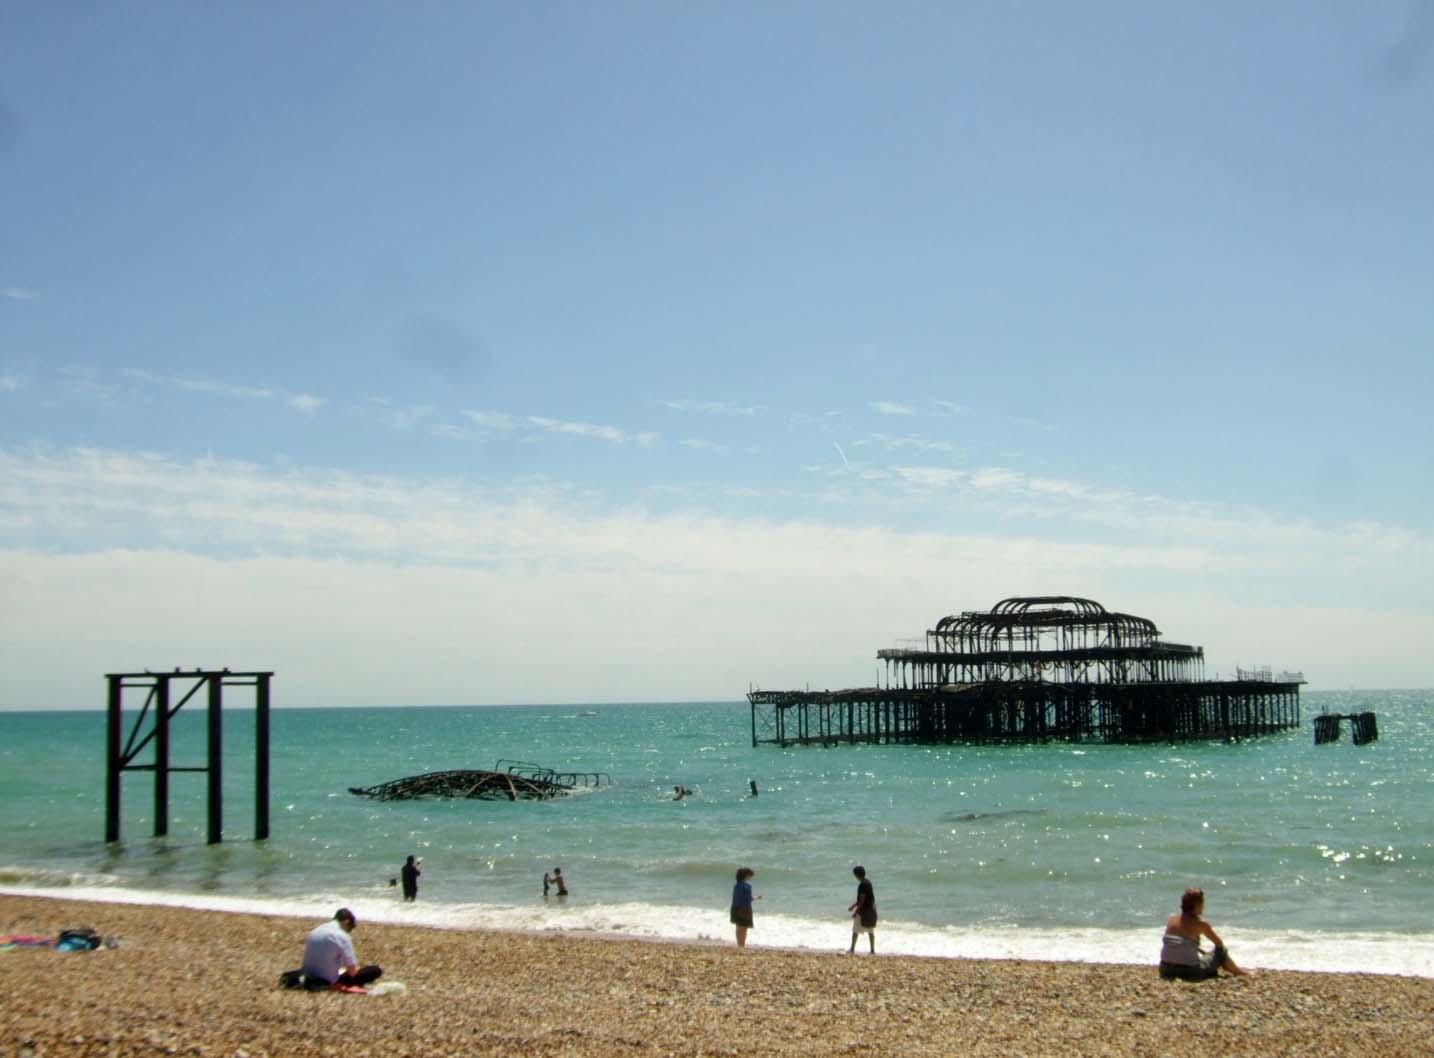 Brighton pier summer